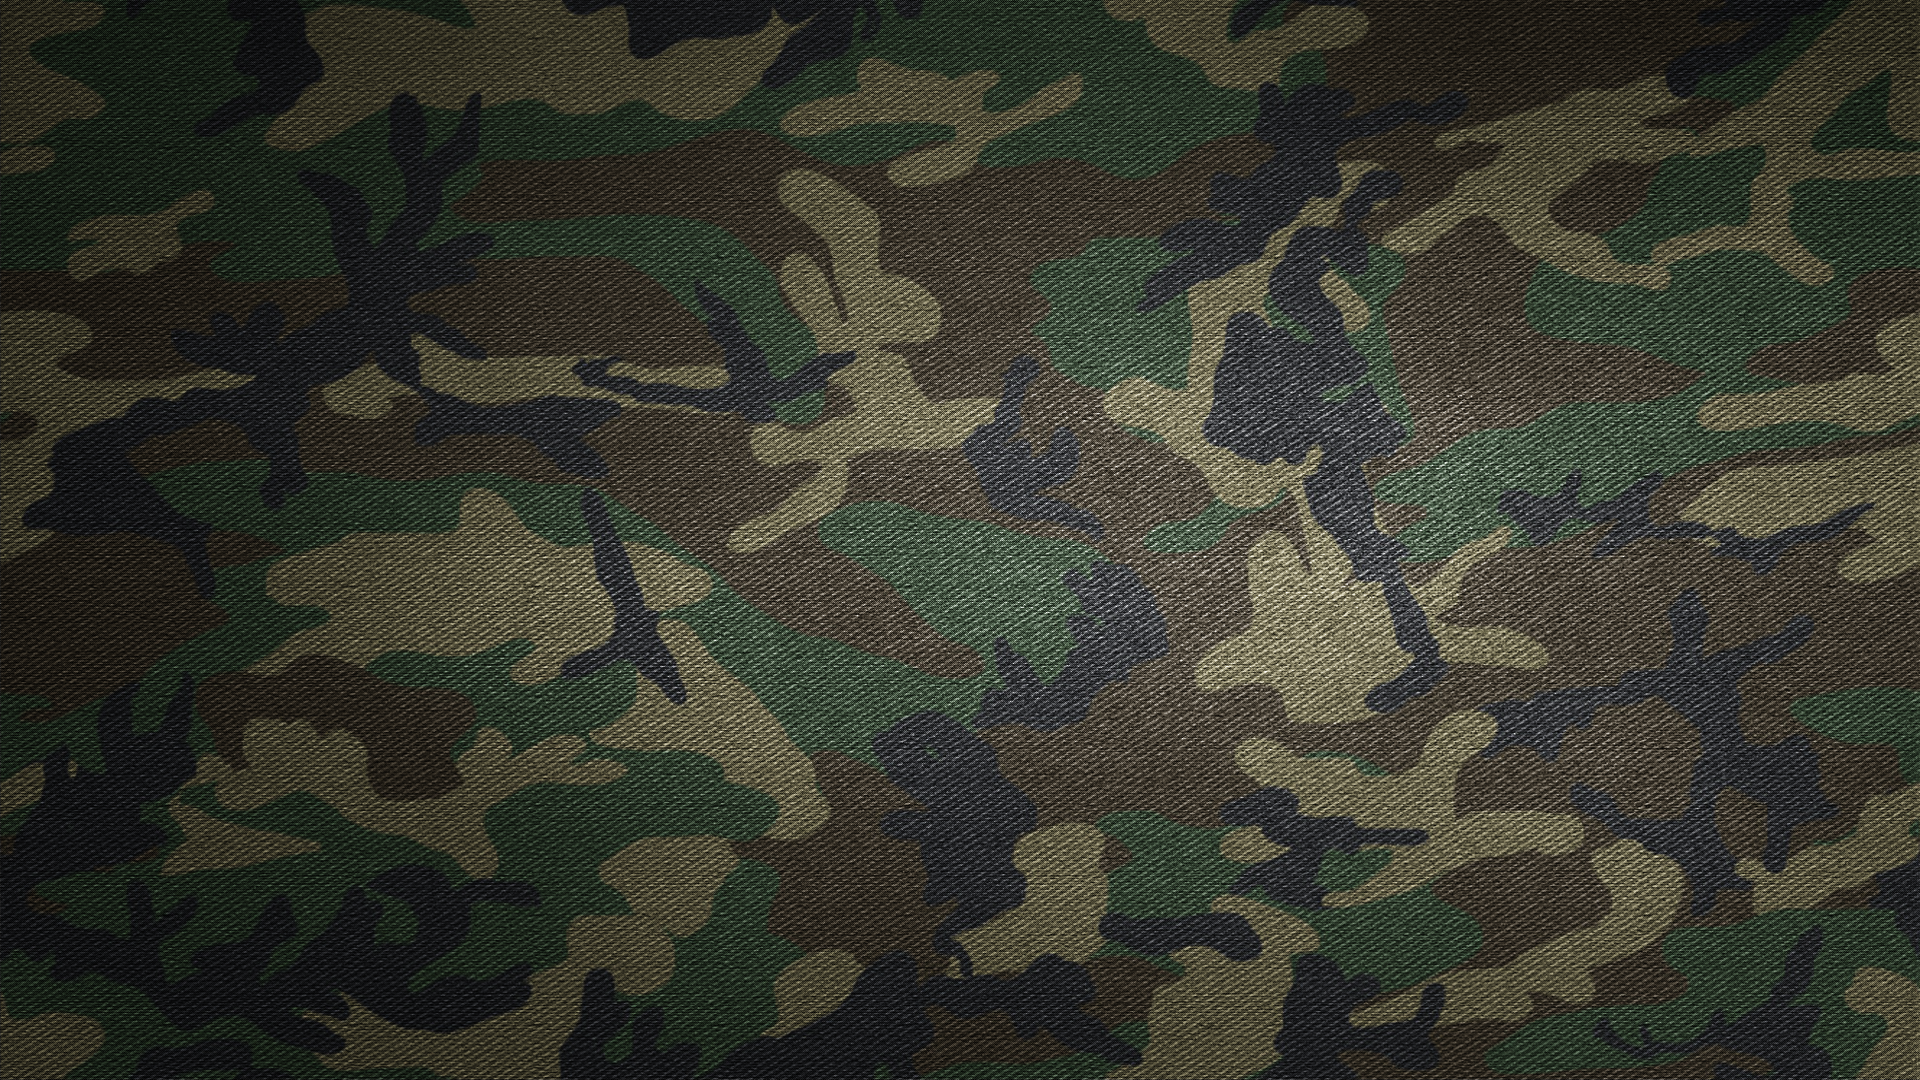 Camo Wallpaper For Computer: Military Patriotic Wallpaper For Desktop